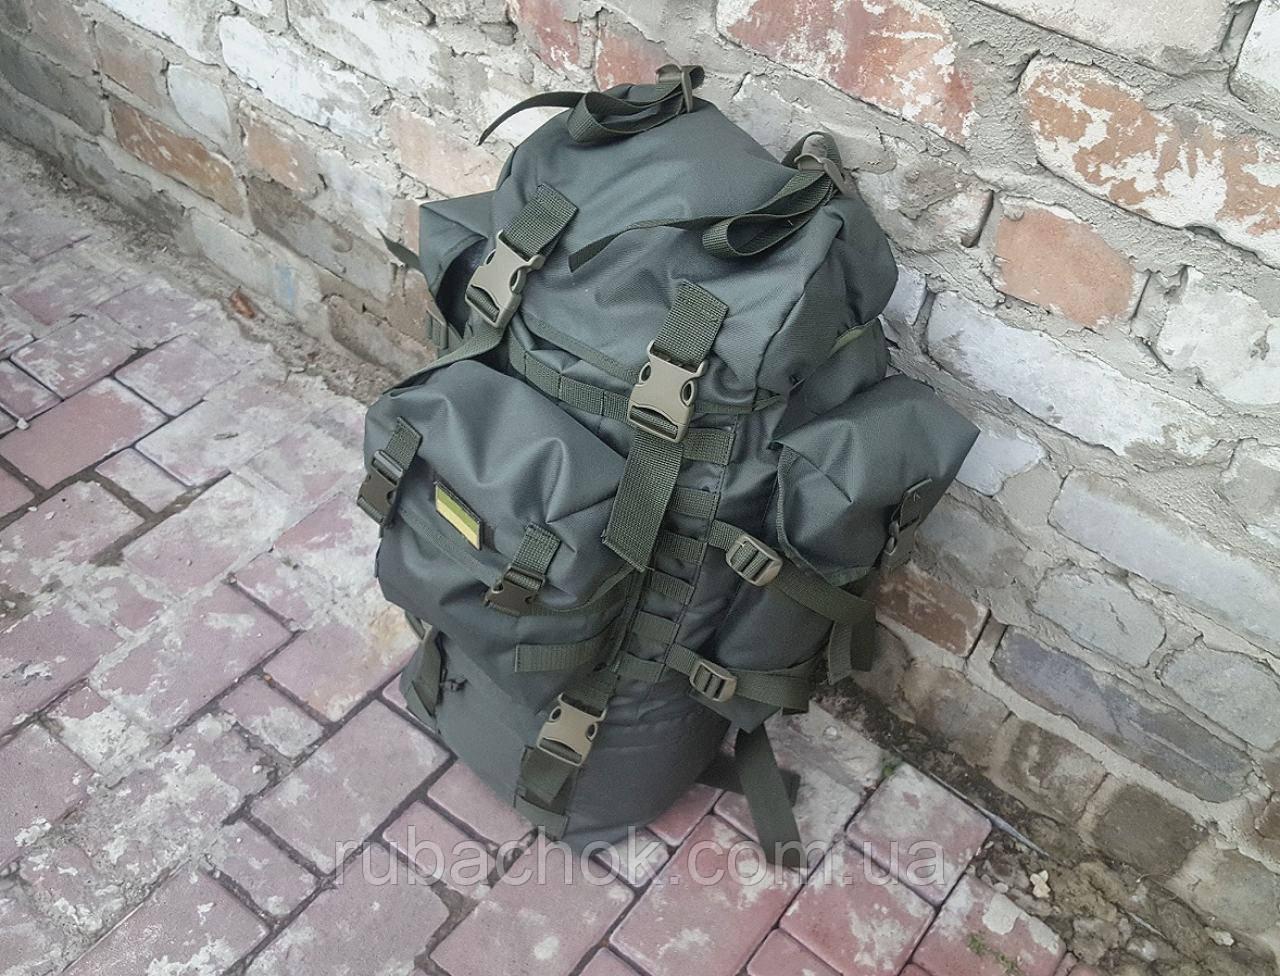 Туристический армейский супер-крепкий рюкзак на 75 литров афган. Нейлон 1000D